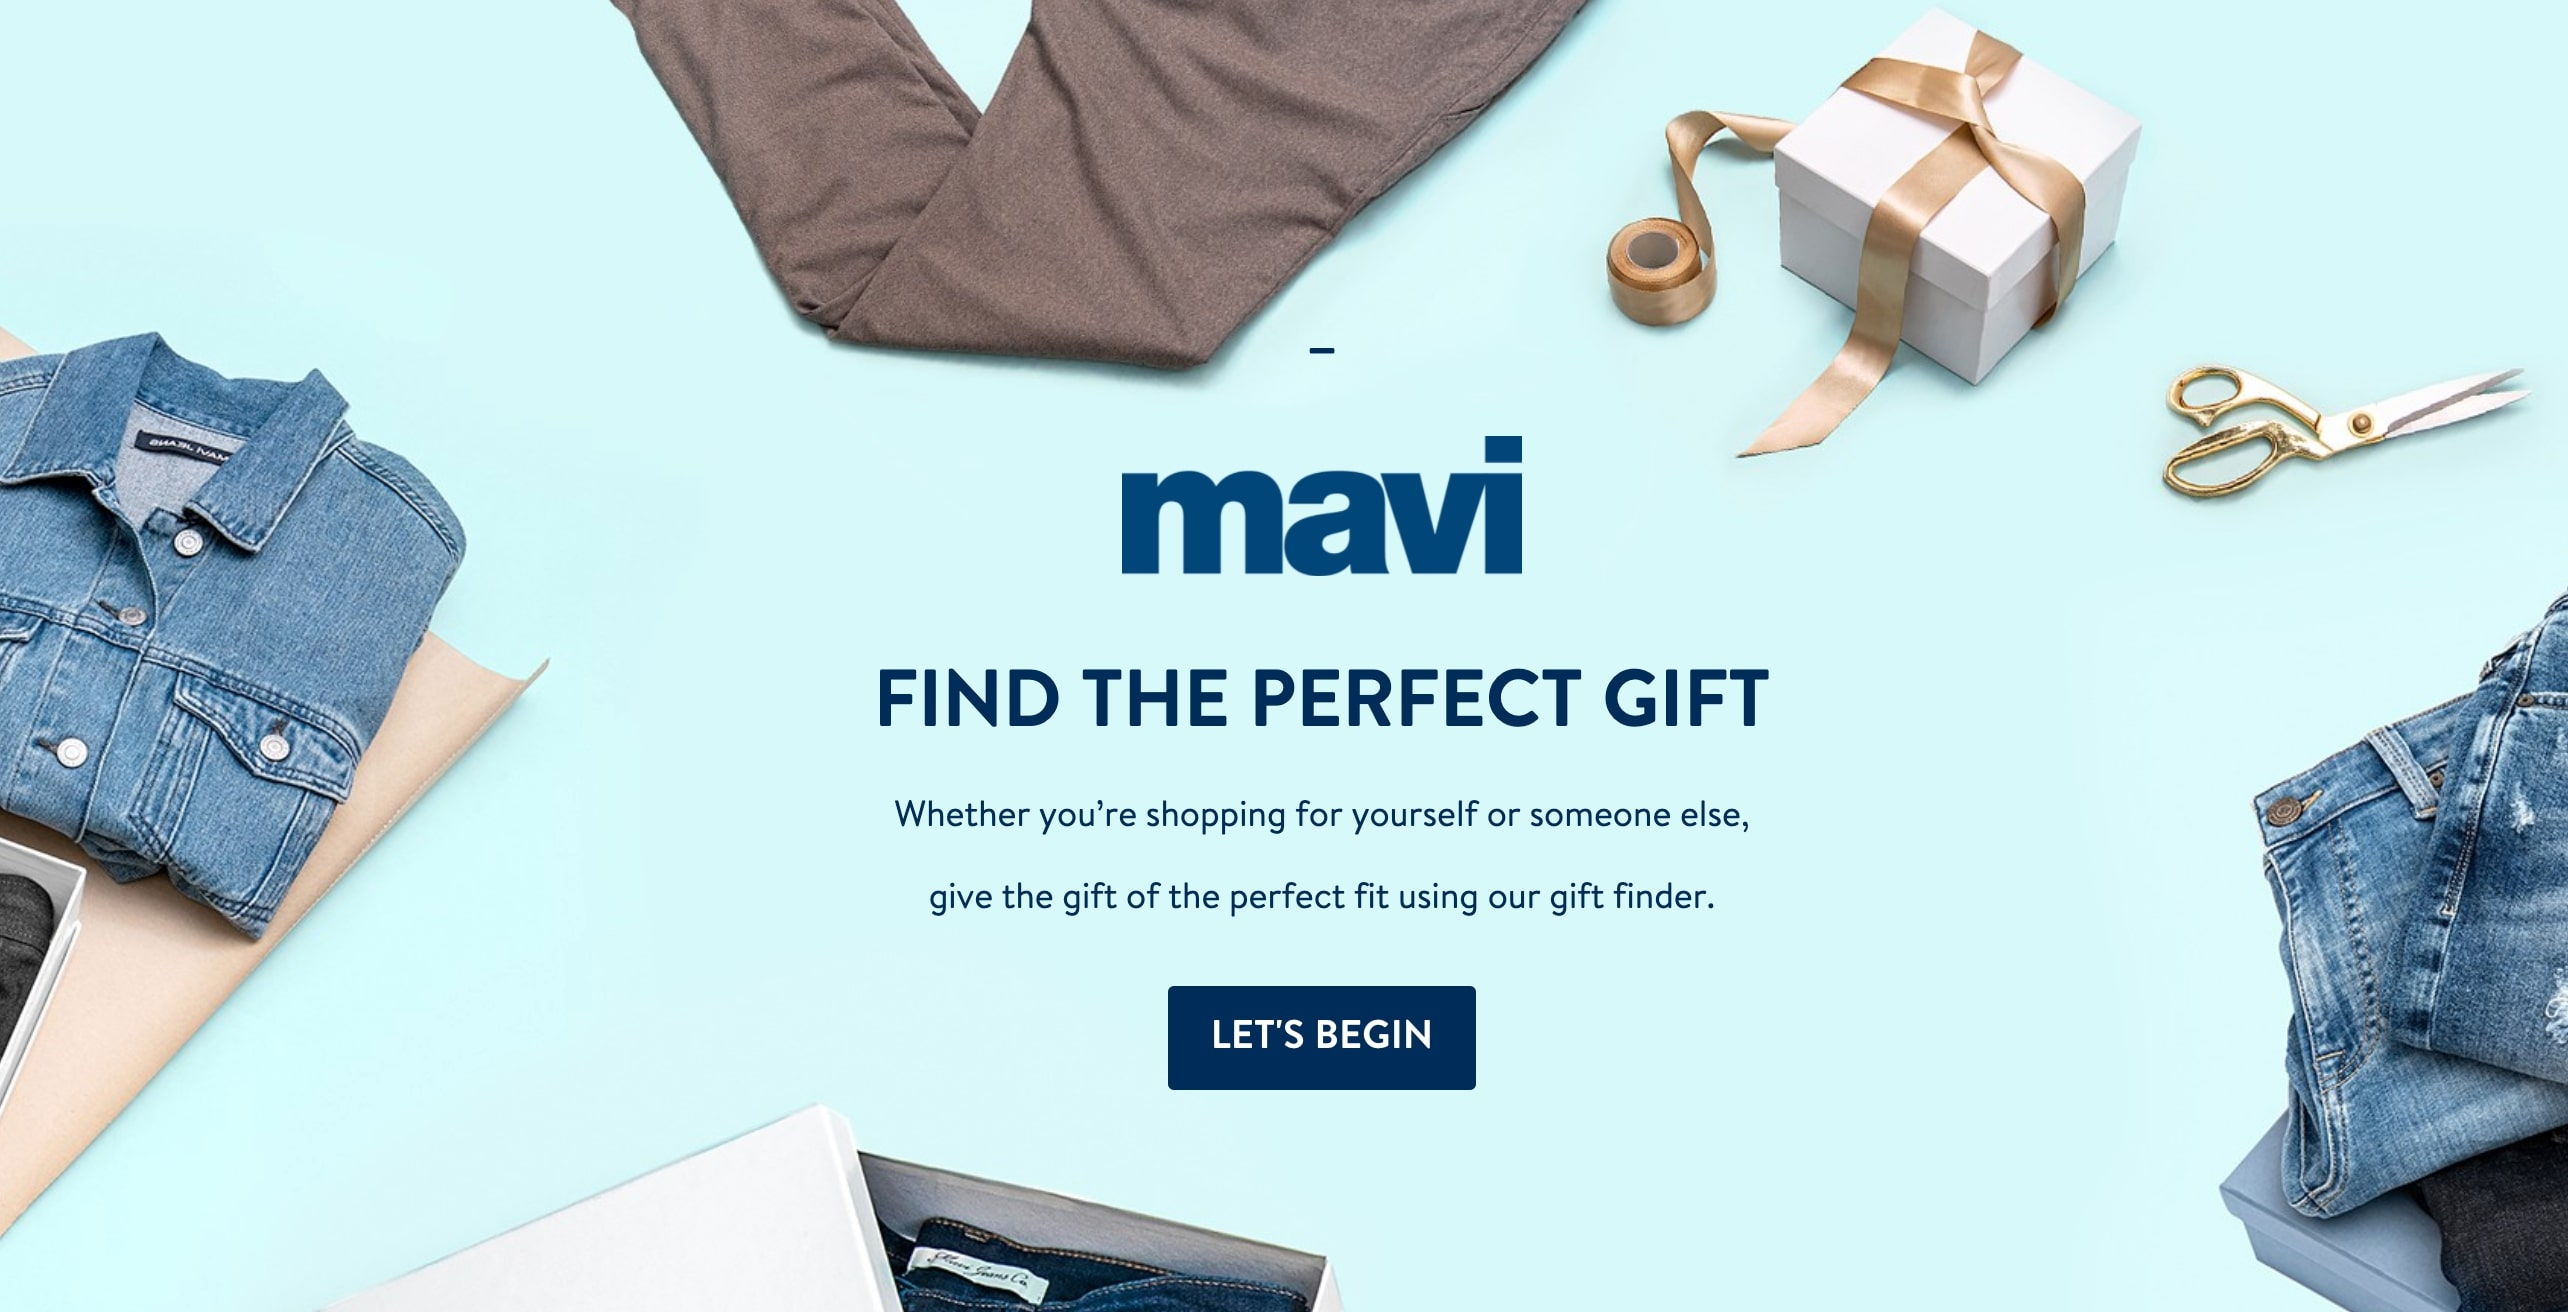 Apparel quiz - Mavi jeans - gift finder